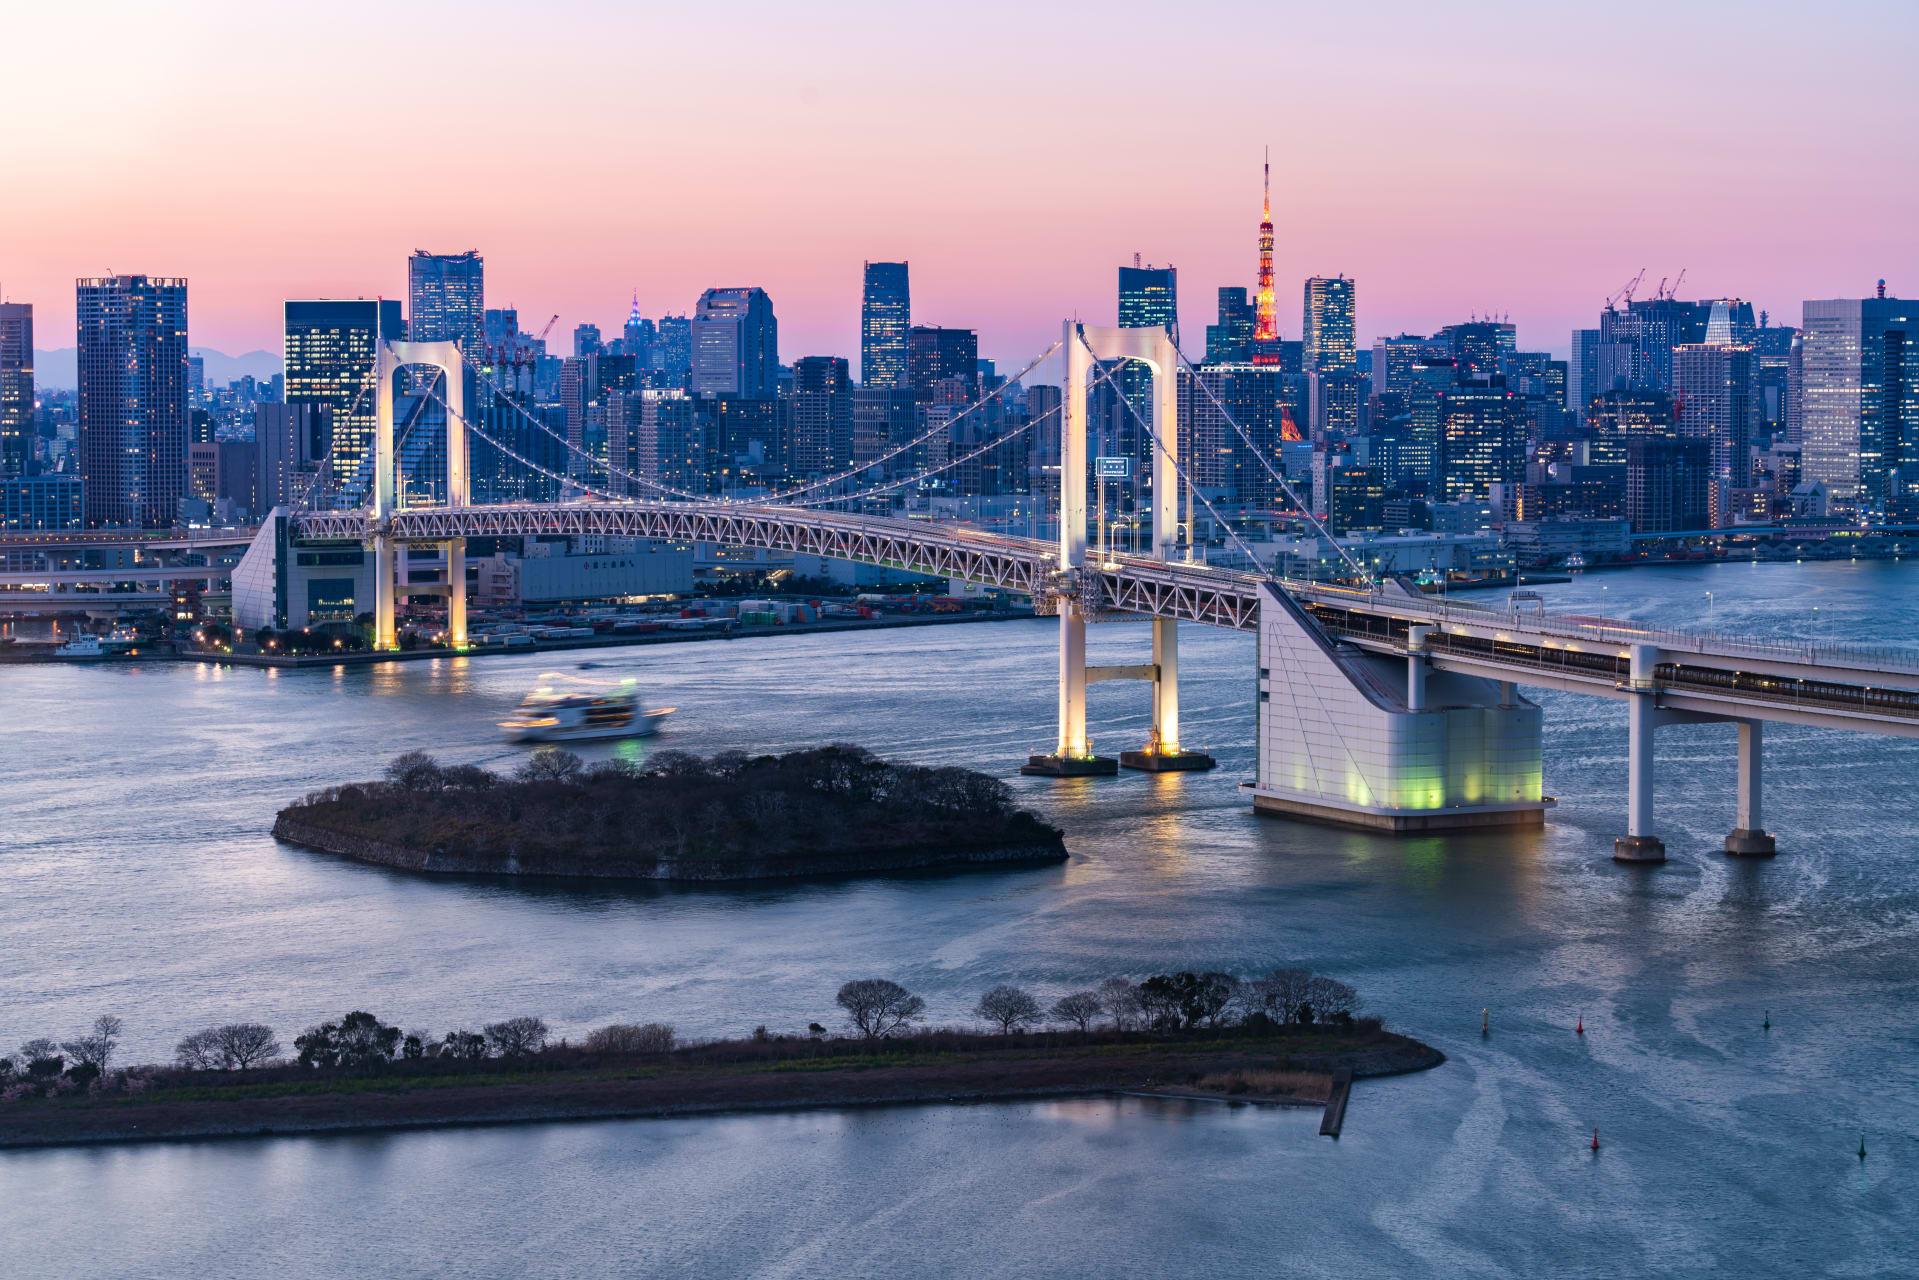 Tokyo - Tokyo Walk 4: Odaiba, the Entertainment Island in Tokyo Bay